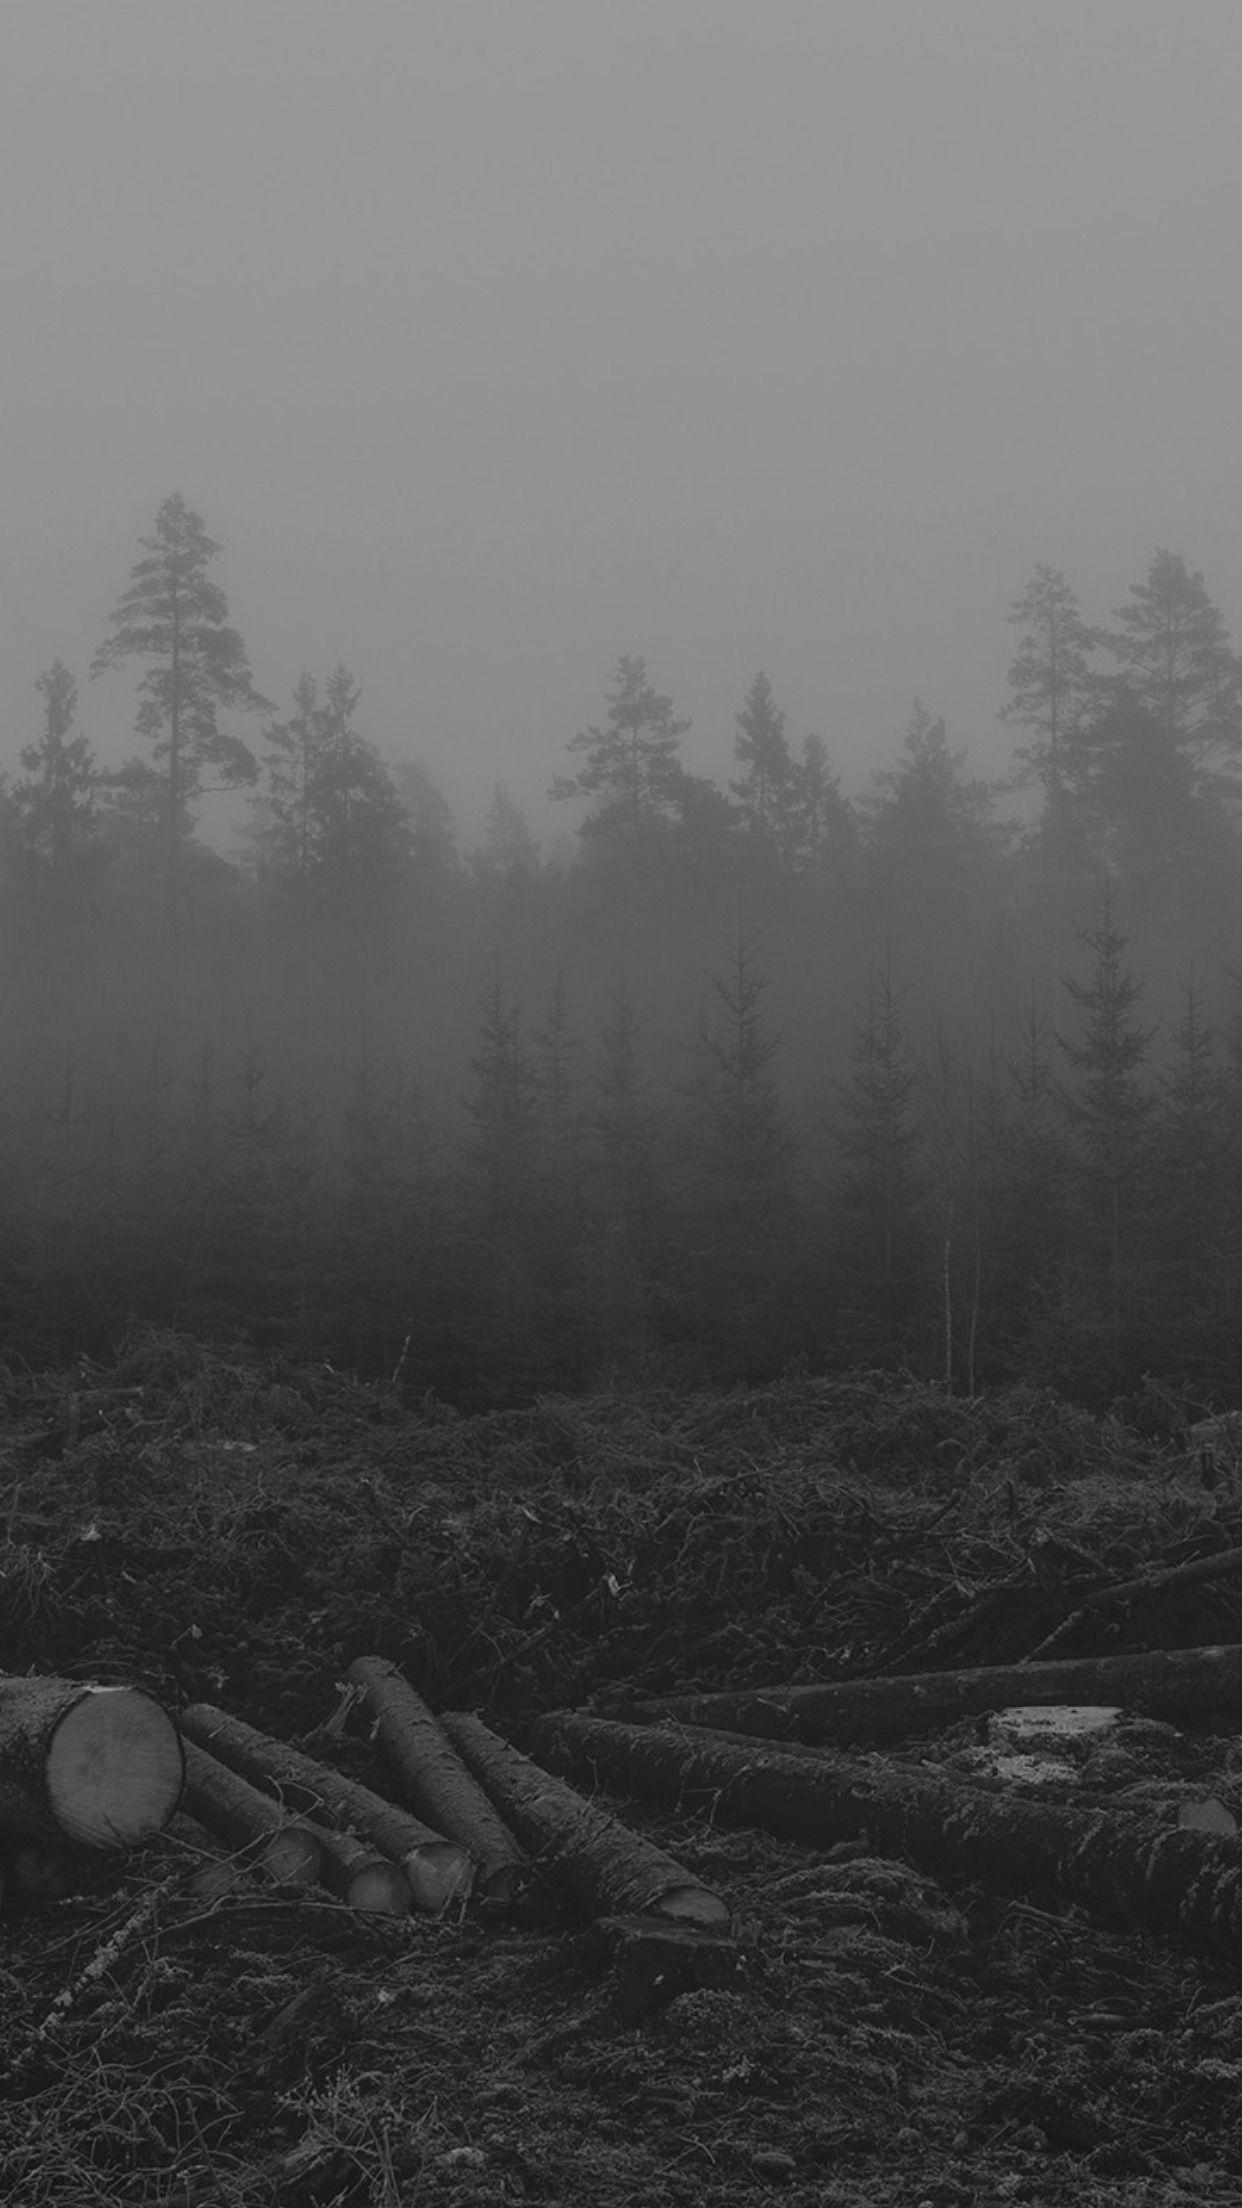 Dark Depressing Background Posted By John Walker